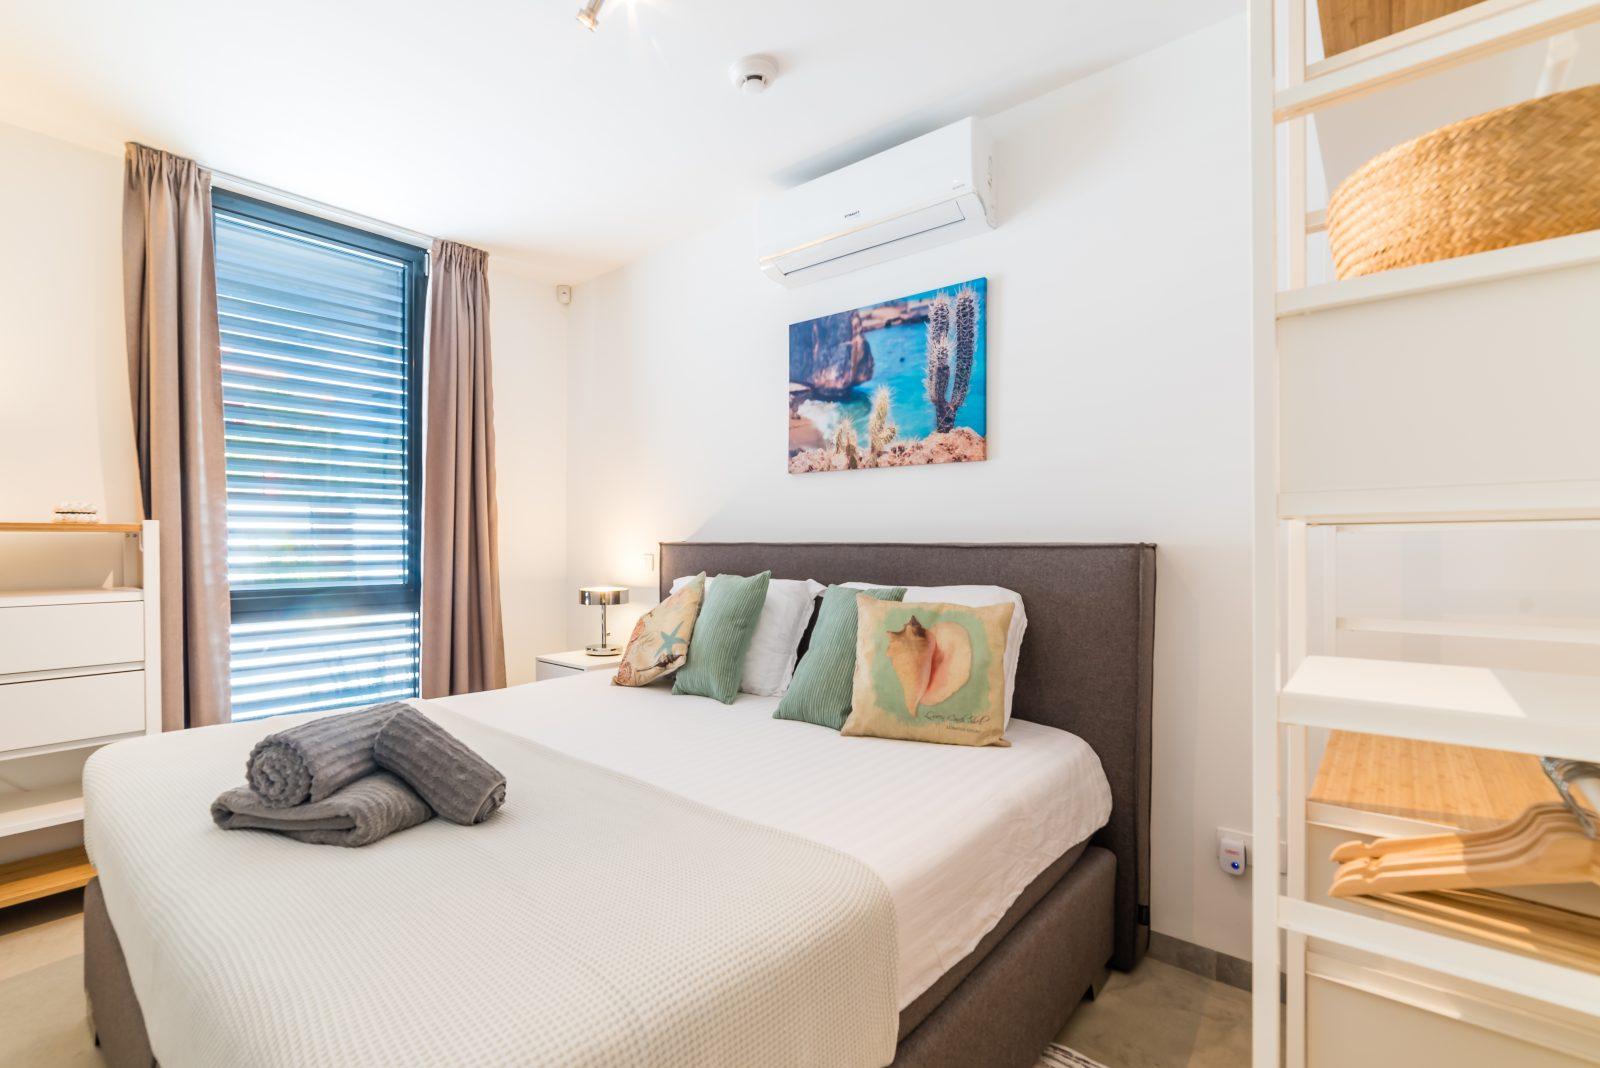 hasta slaapkamer 18 - Curacao - Indigo